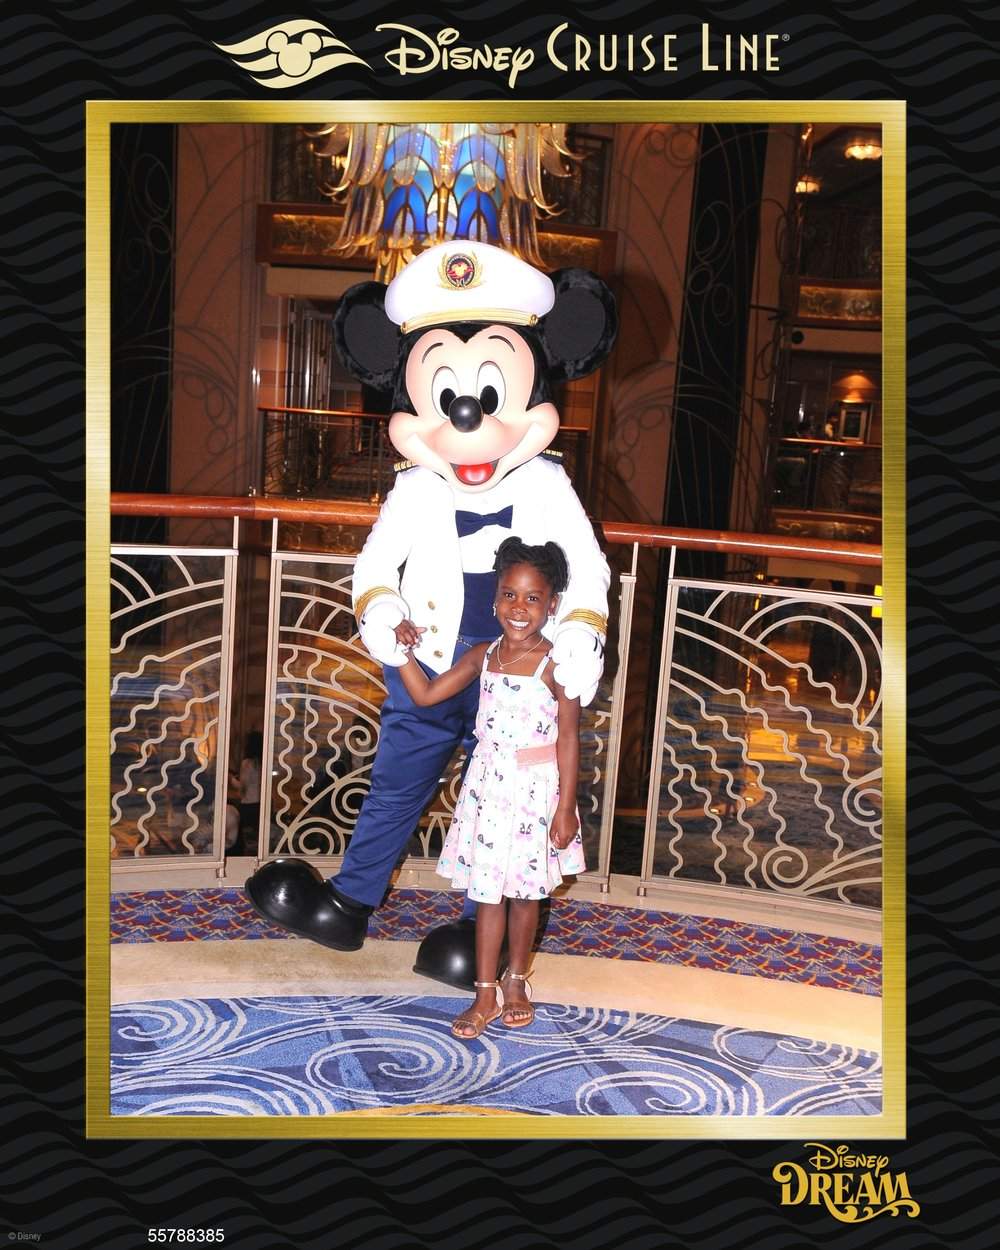 736-55788385-Classic CL Mickey F 4 MS-44183_GPR.JPG